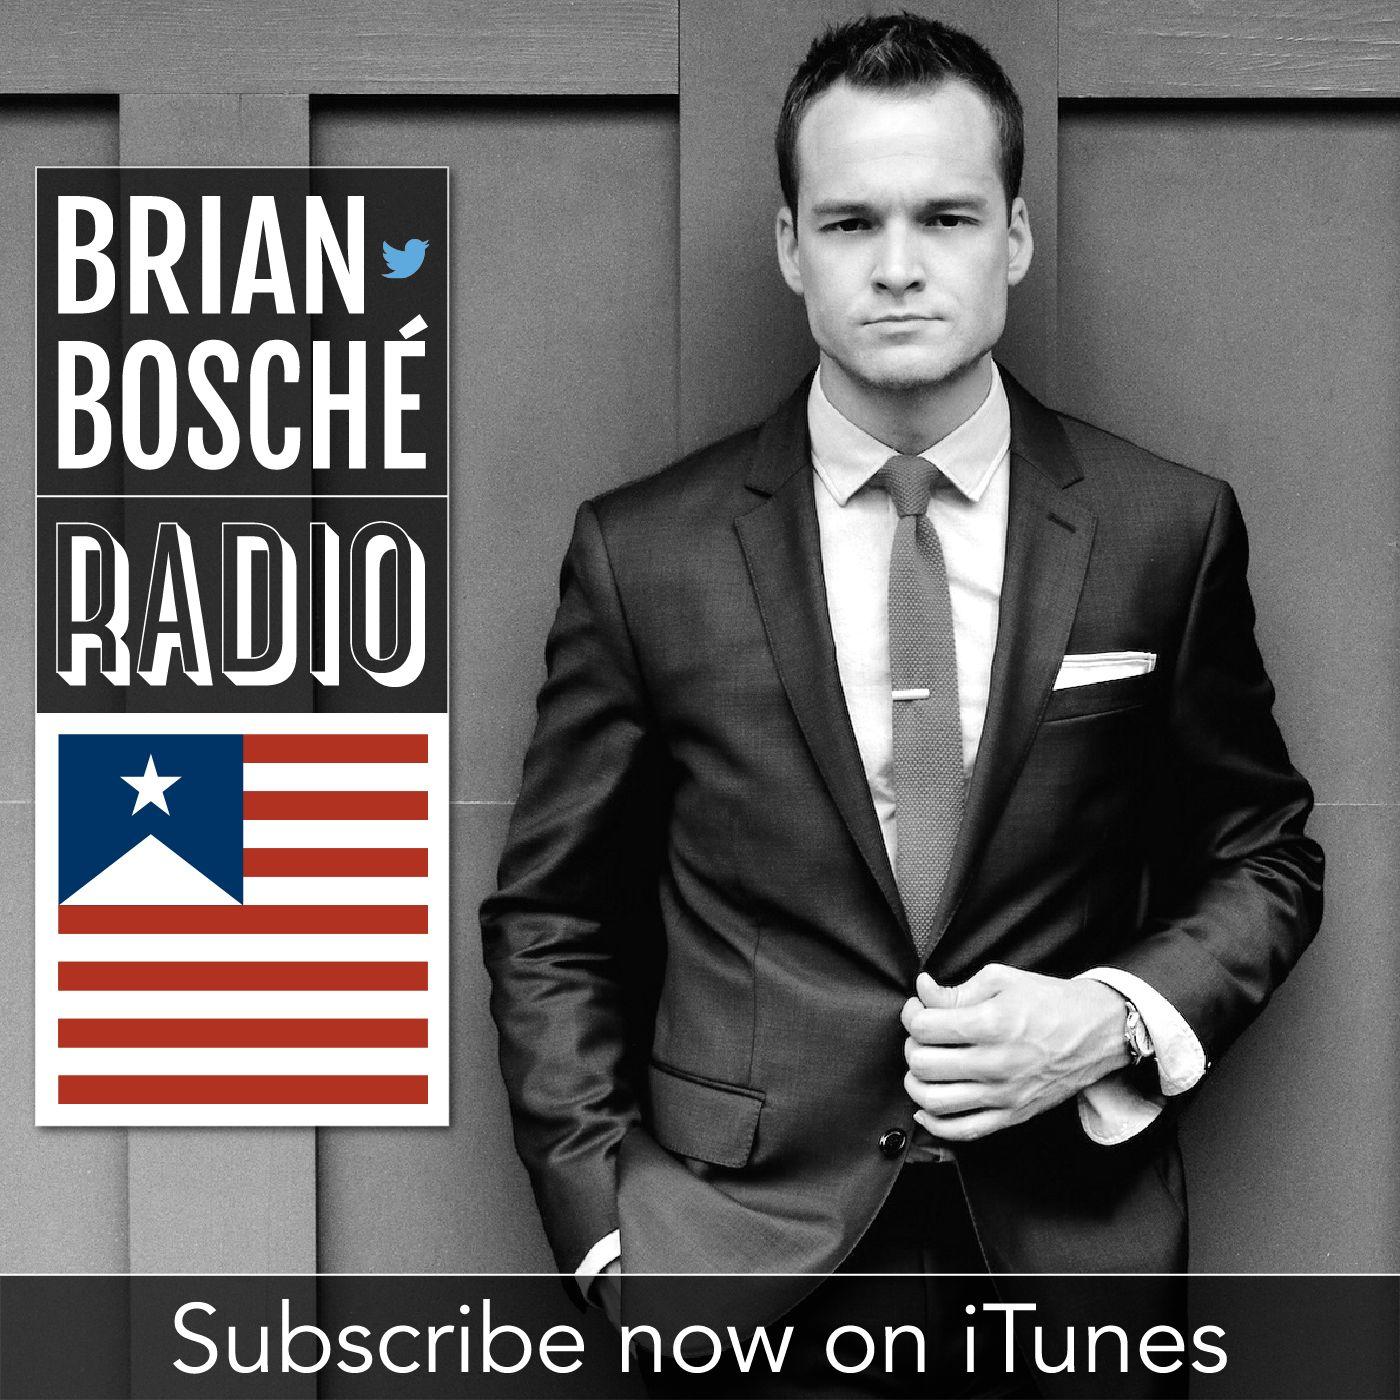 Brian Bosché Radio